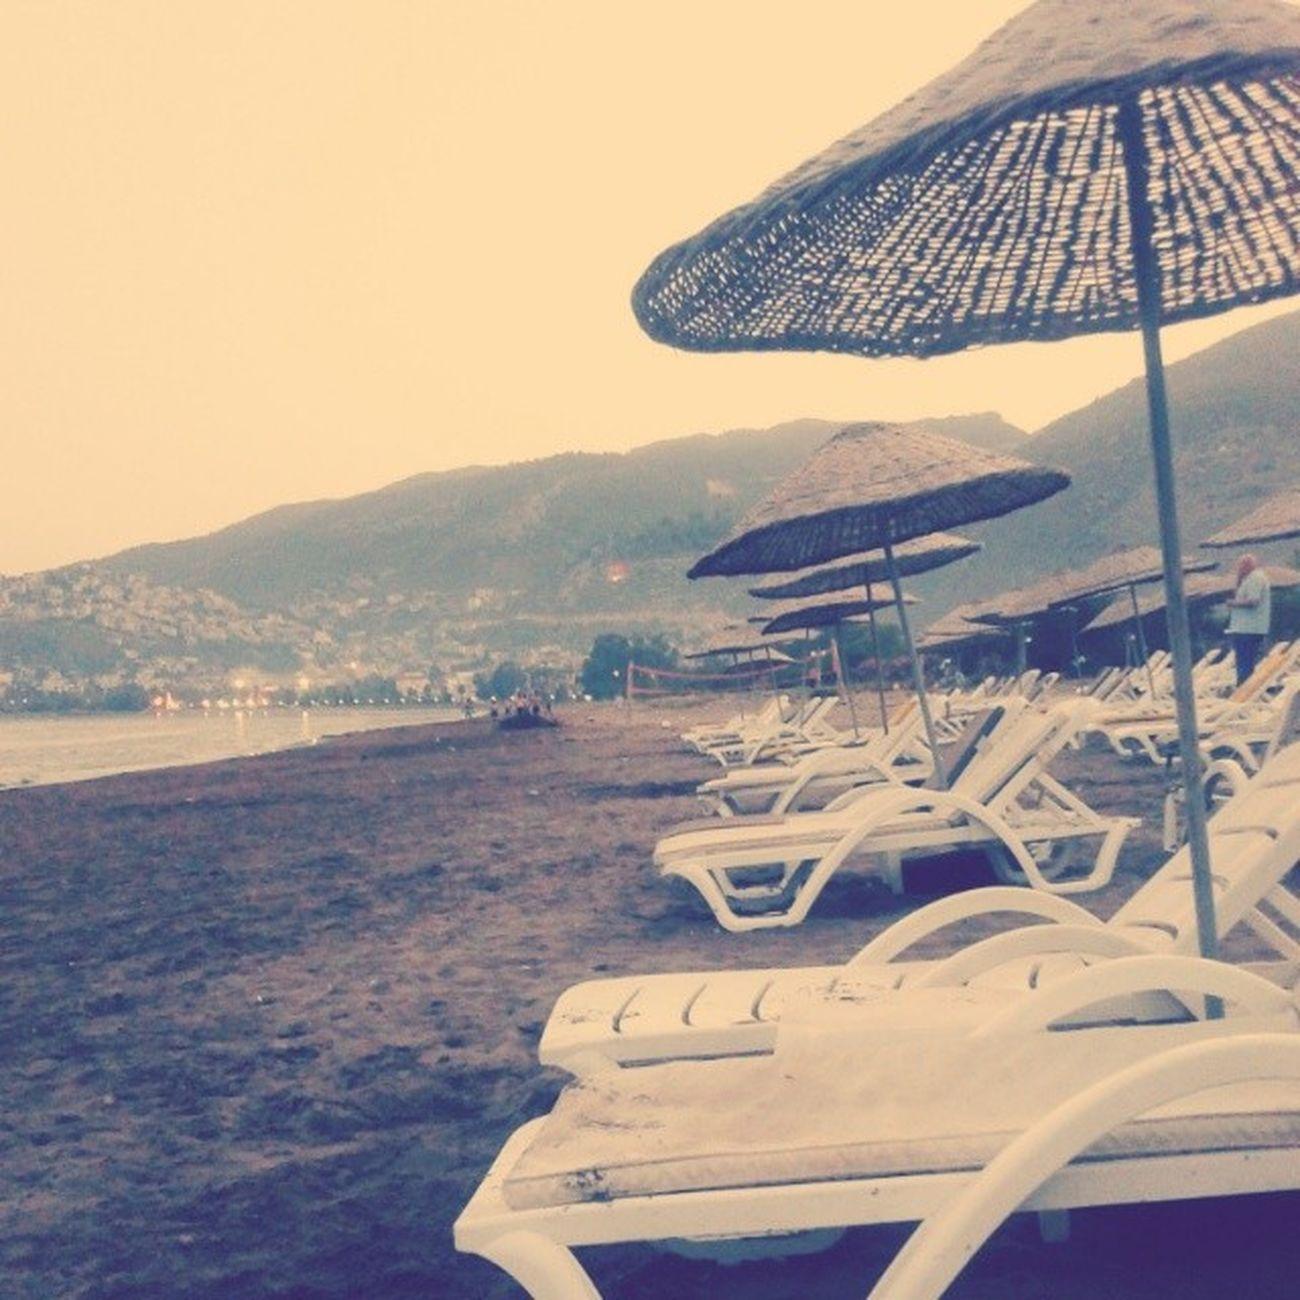 Bu saatte deniz sefasii miiii Bizeheptatil Finike Deniz Sahil kum beach holiday tatil sea iştenciktikgeldik friends